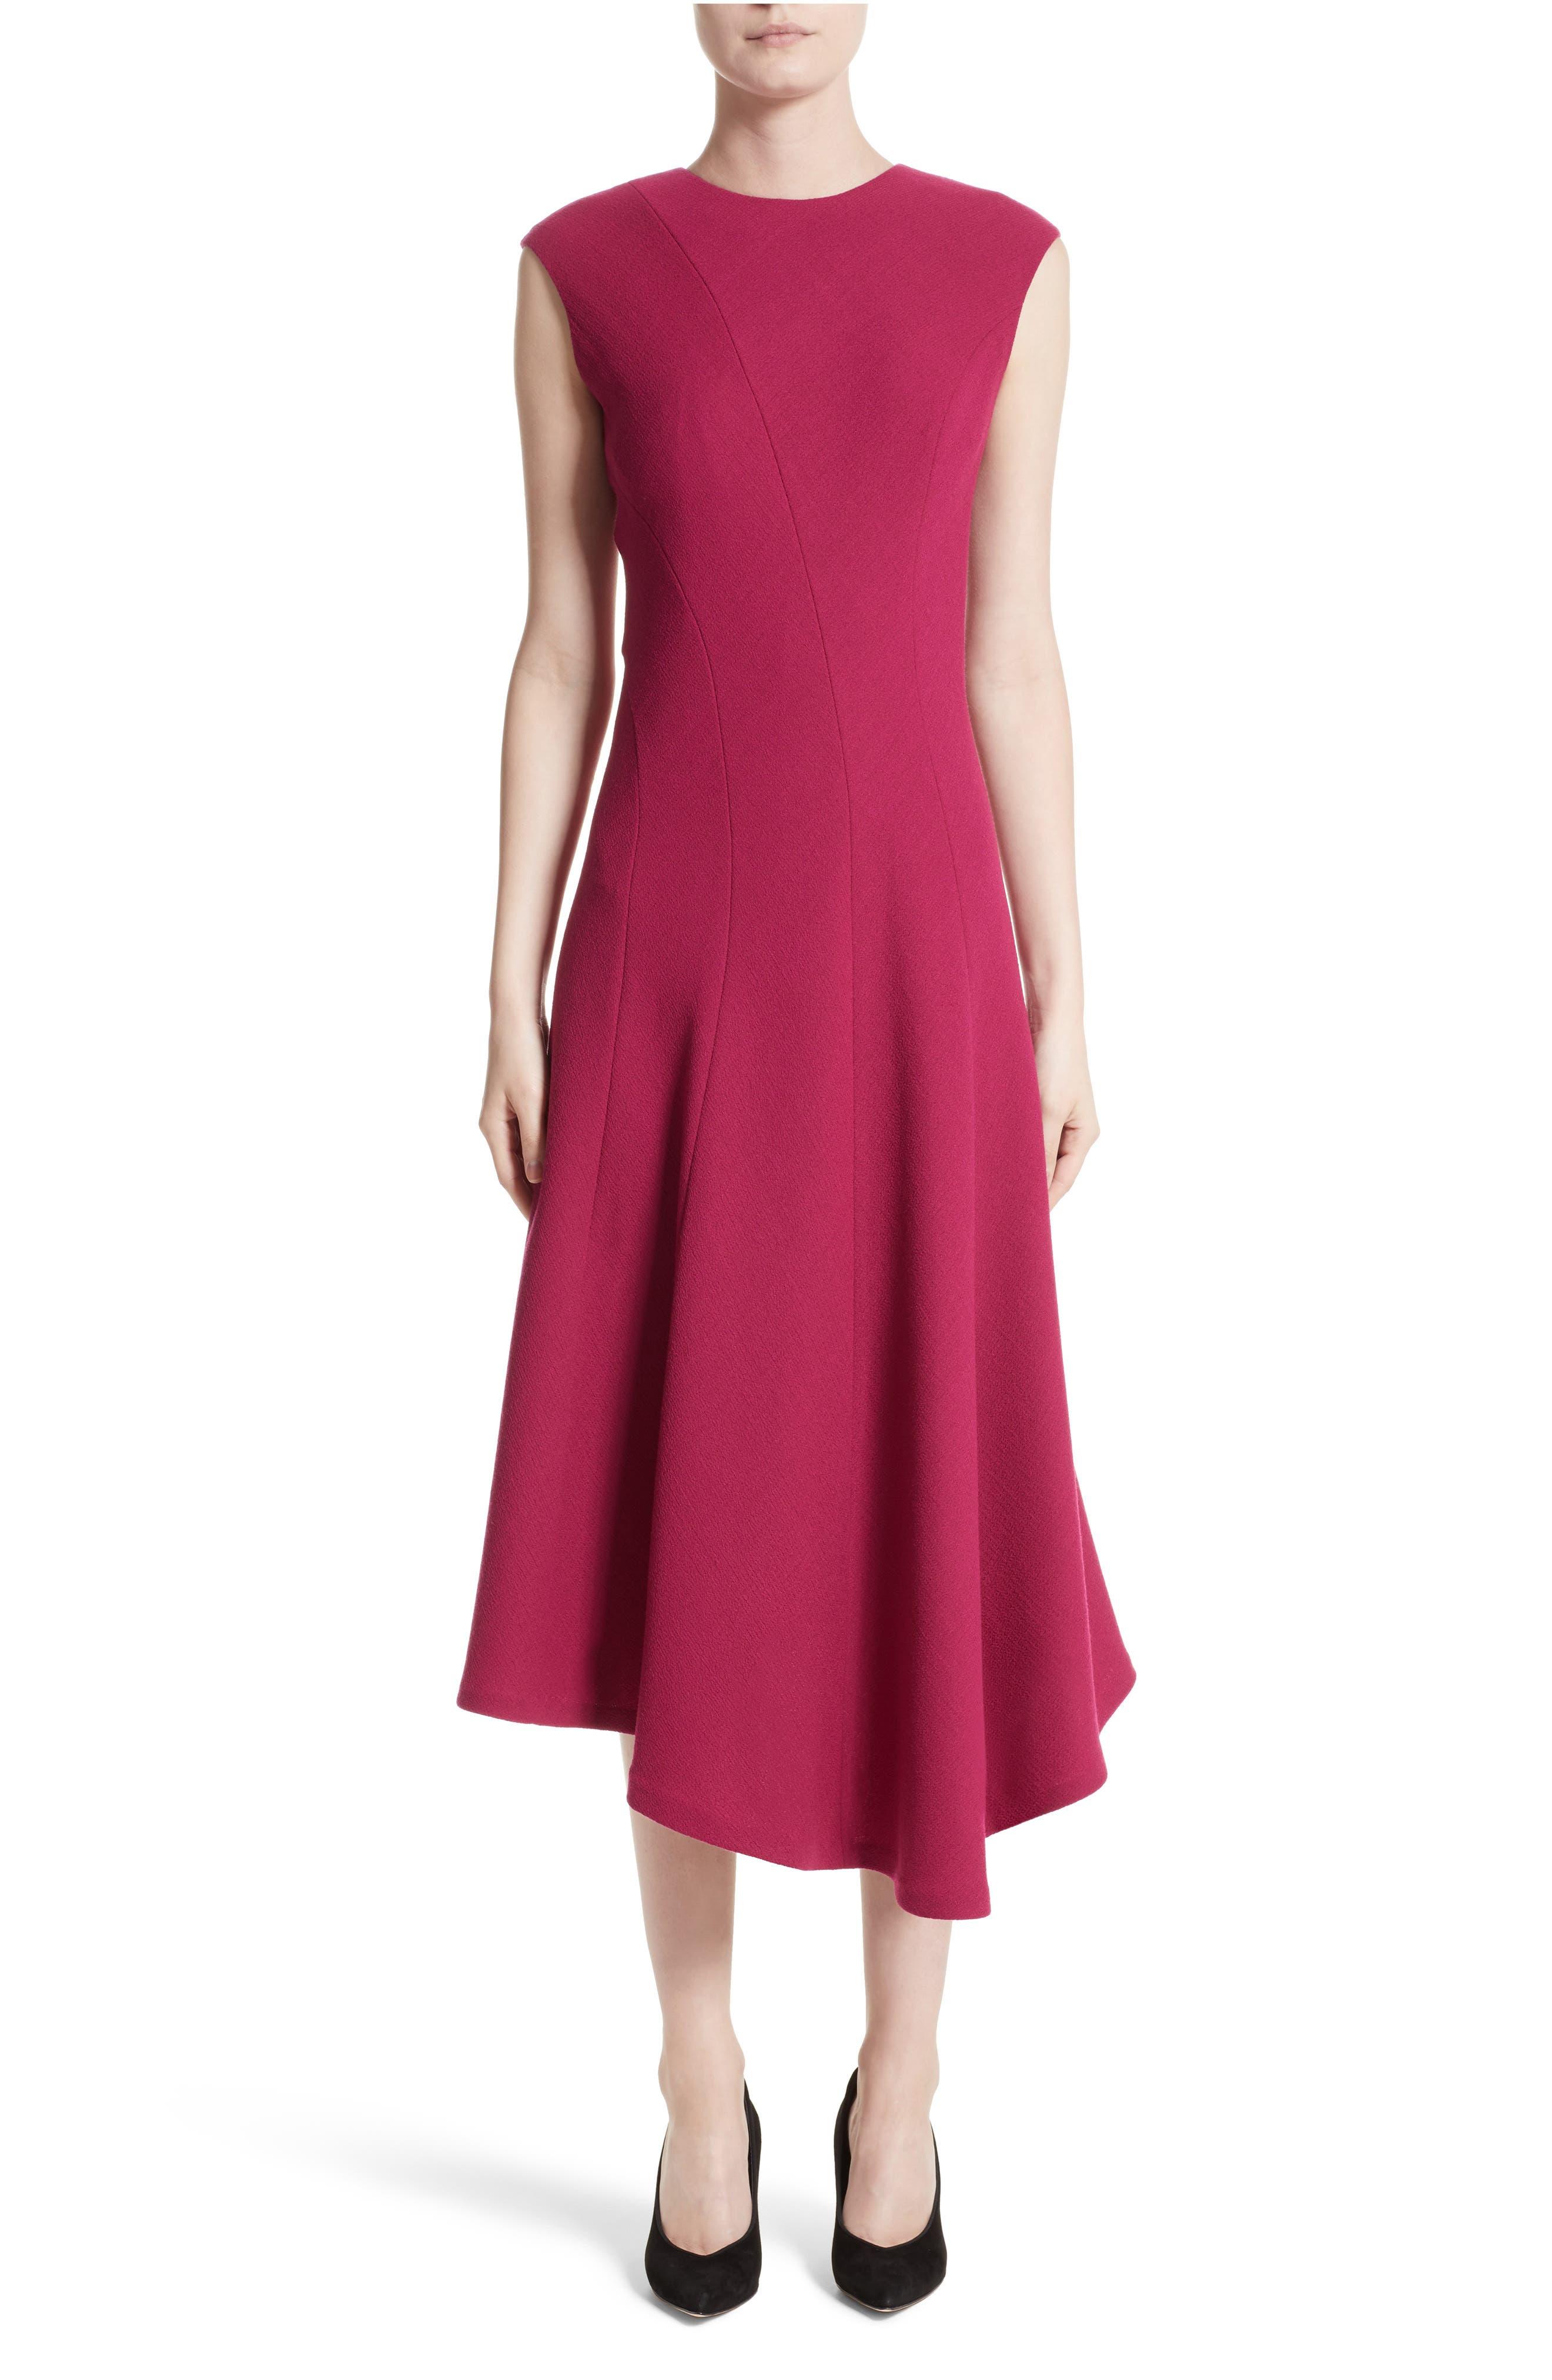 Aveena Wool Interlock Dress,                         Main,                         color, Amaryllis